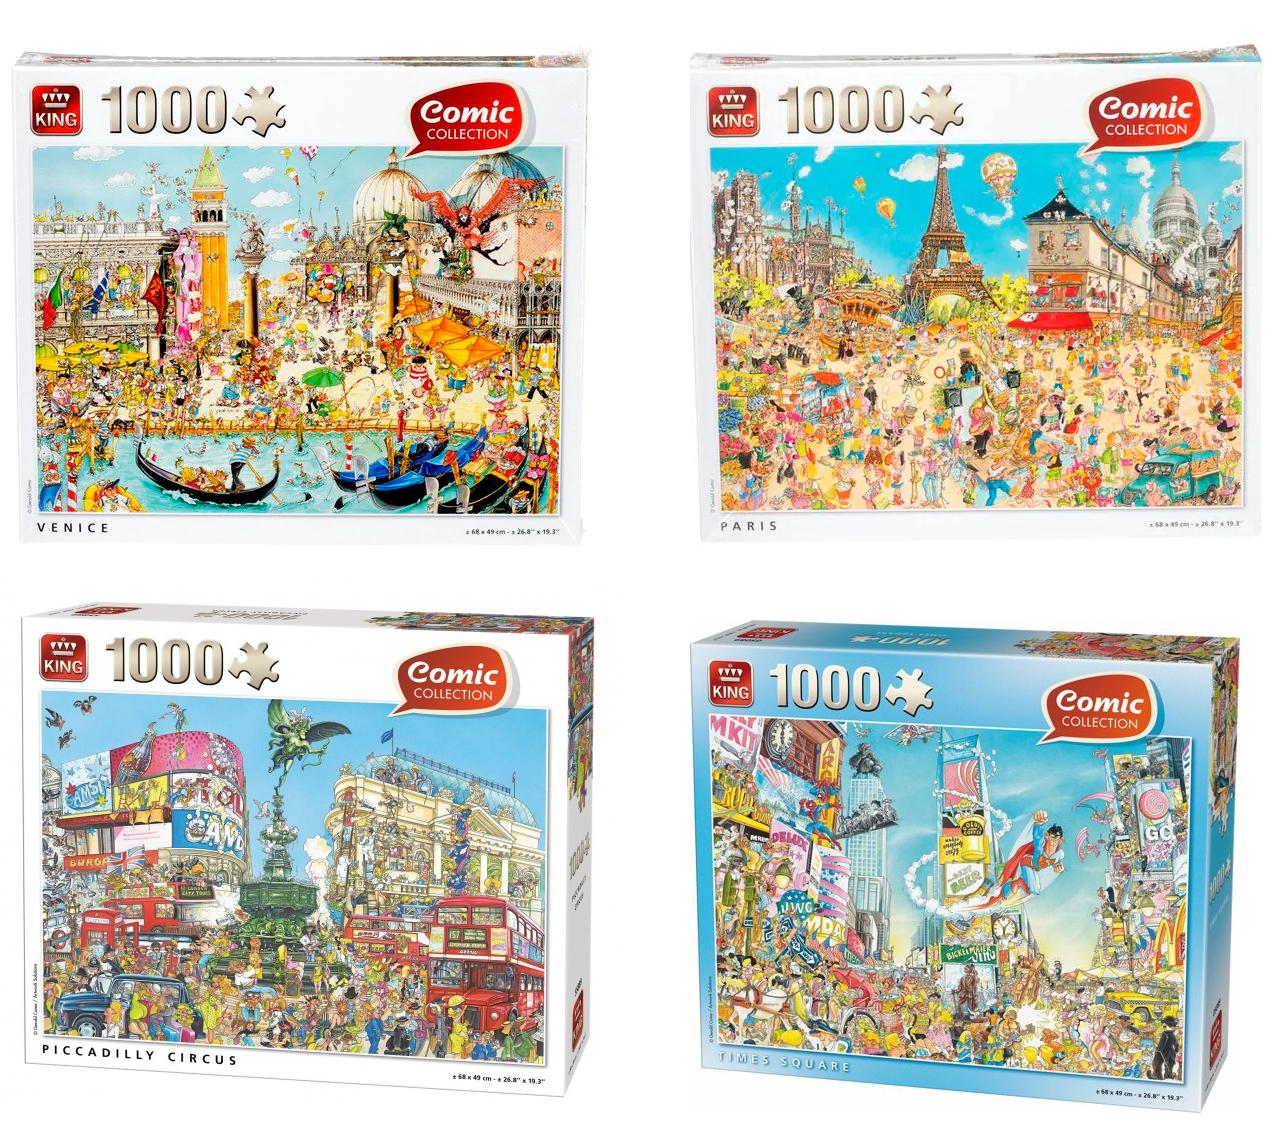 King Collection Legpuzzels 1000 pcs Venice/Paris/Times Square/Piccadilly Circus voor €2,89 @ Kruidvat